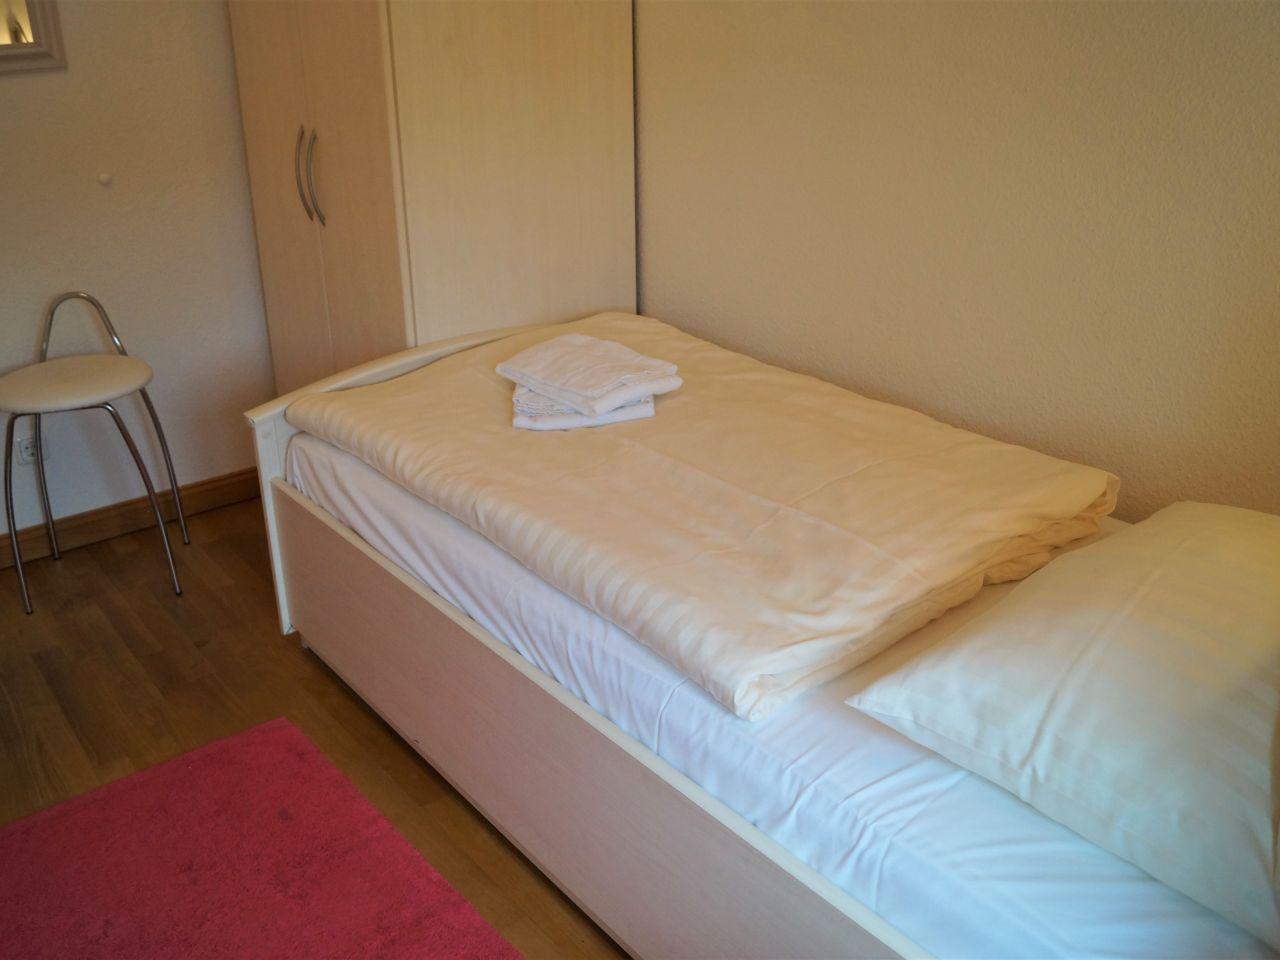 villa perkunos wohnung nr 8 in heringsdorf ostseeklar. Black Bedroom Furniture Sets. Home Design Ideas